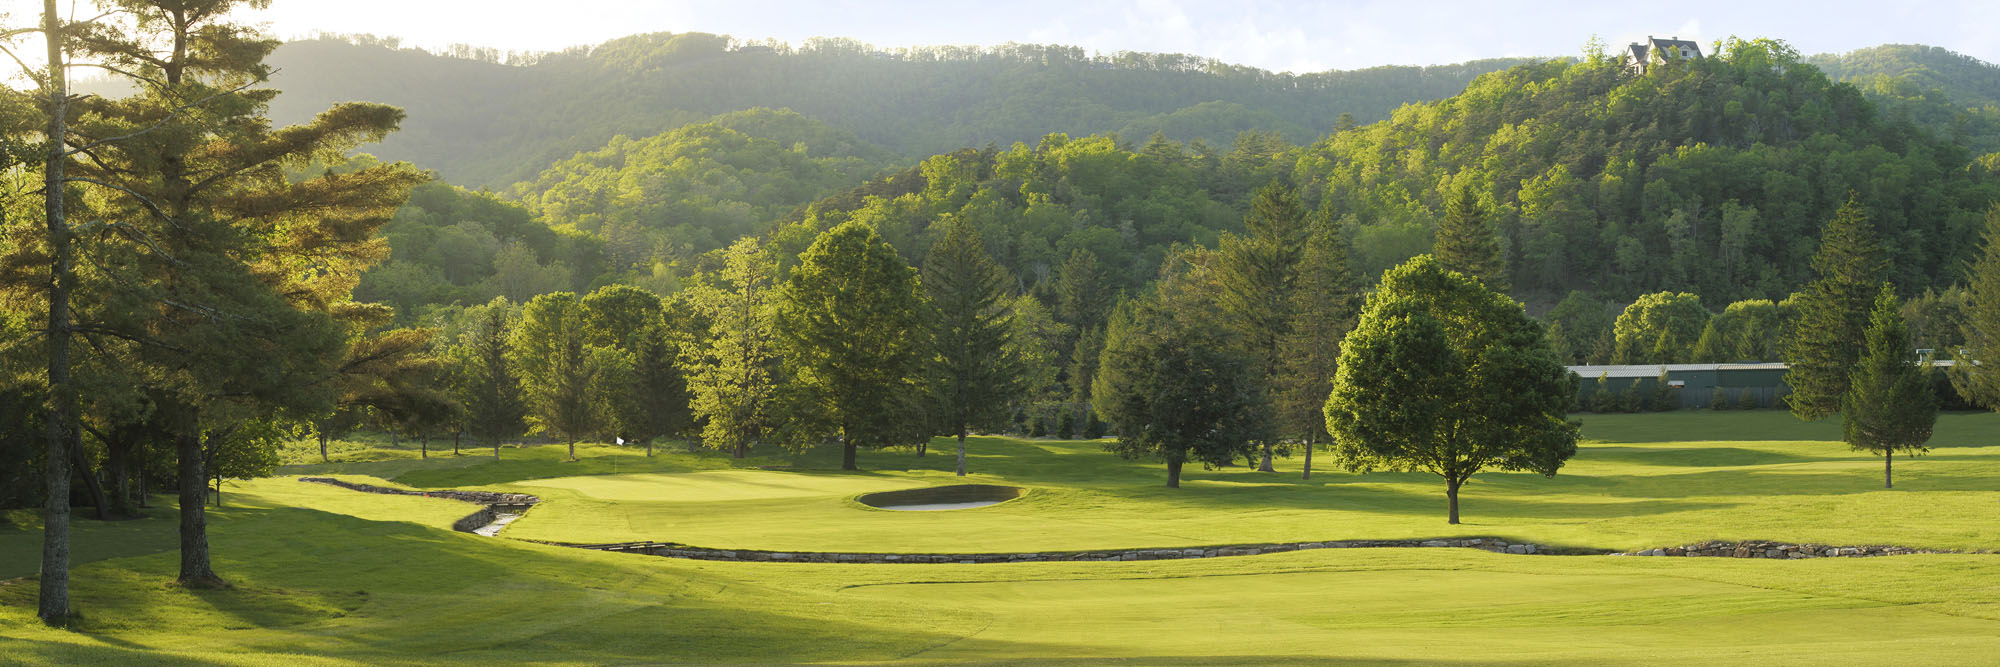 Golf Course Image - The Greenbrier Meadows Course No. 16